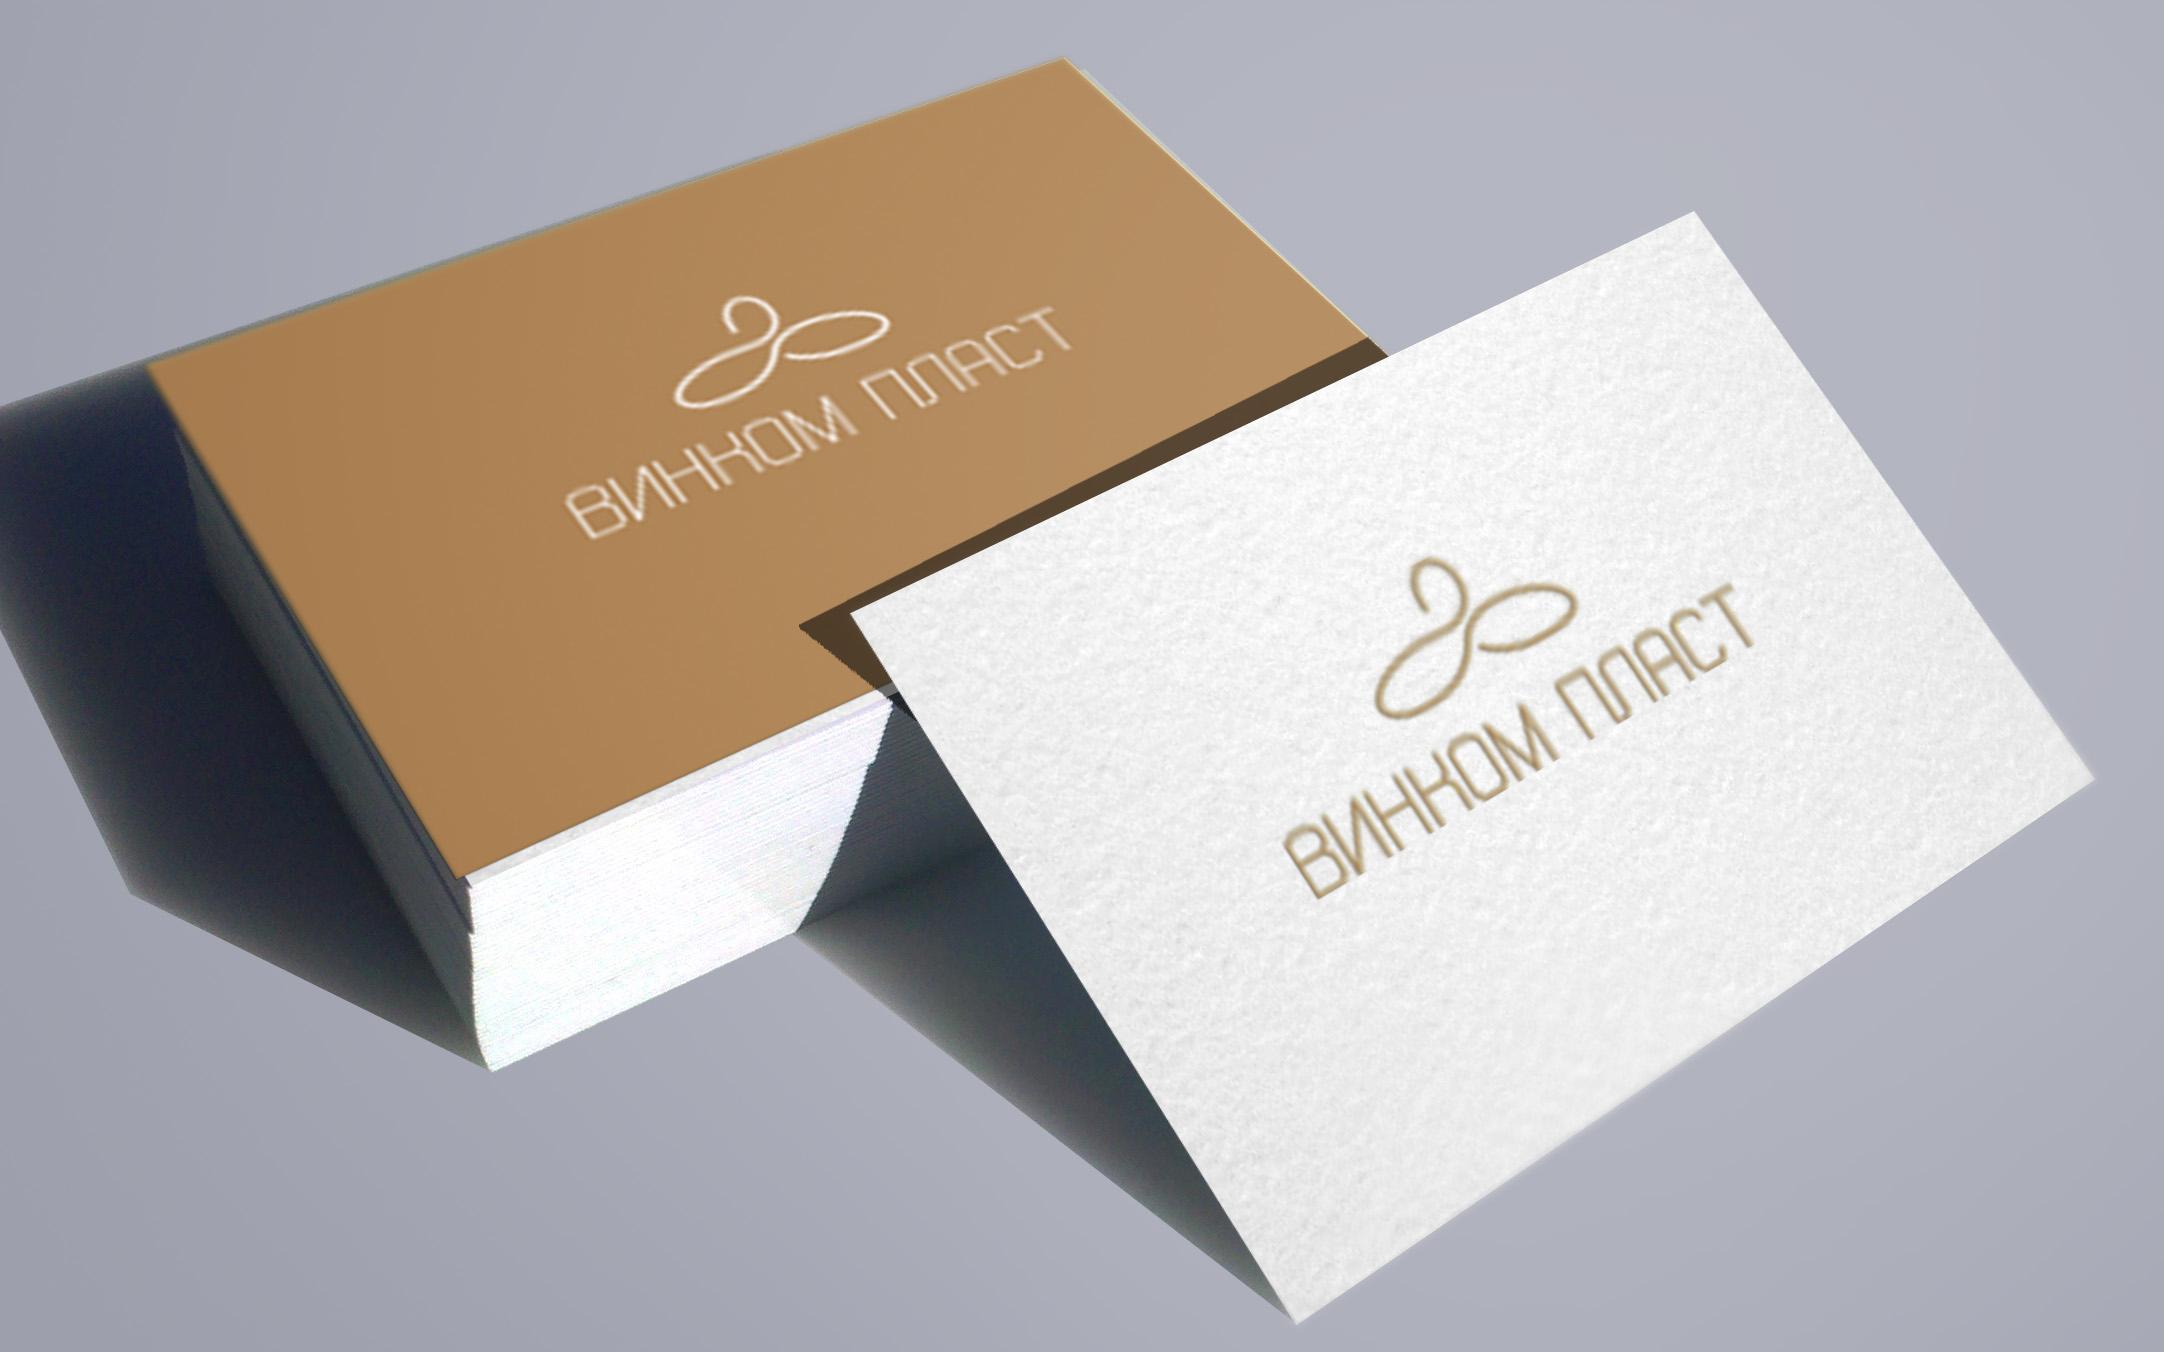 Логотип, фавикон и визитка для компании Винком Пласт  фото f_0825c3deb5e26ee0.jpg